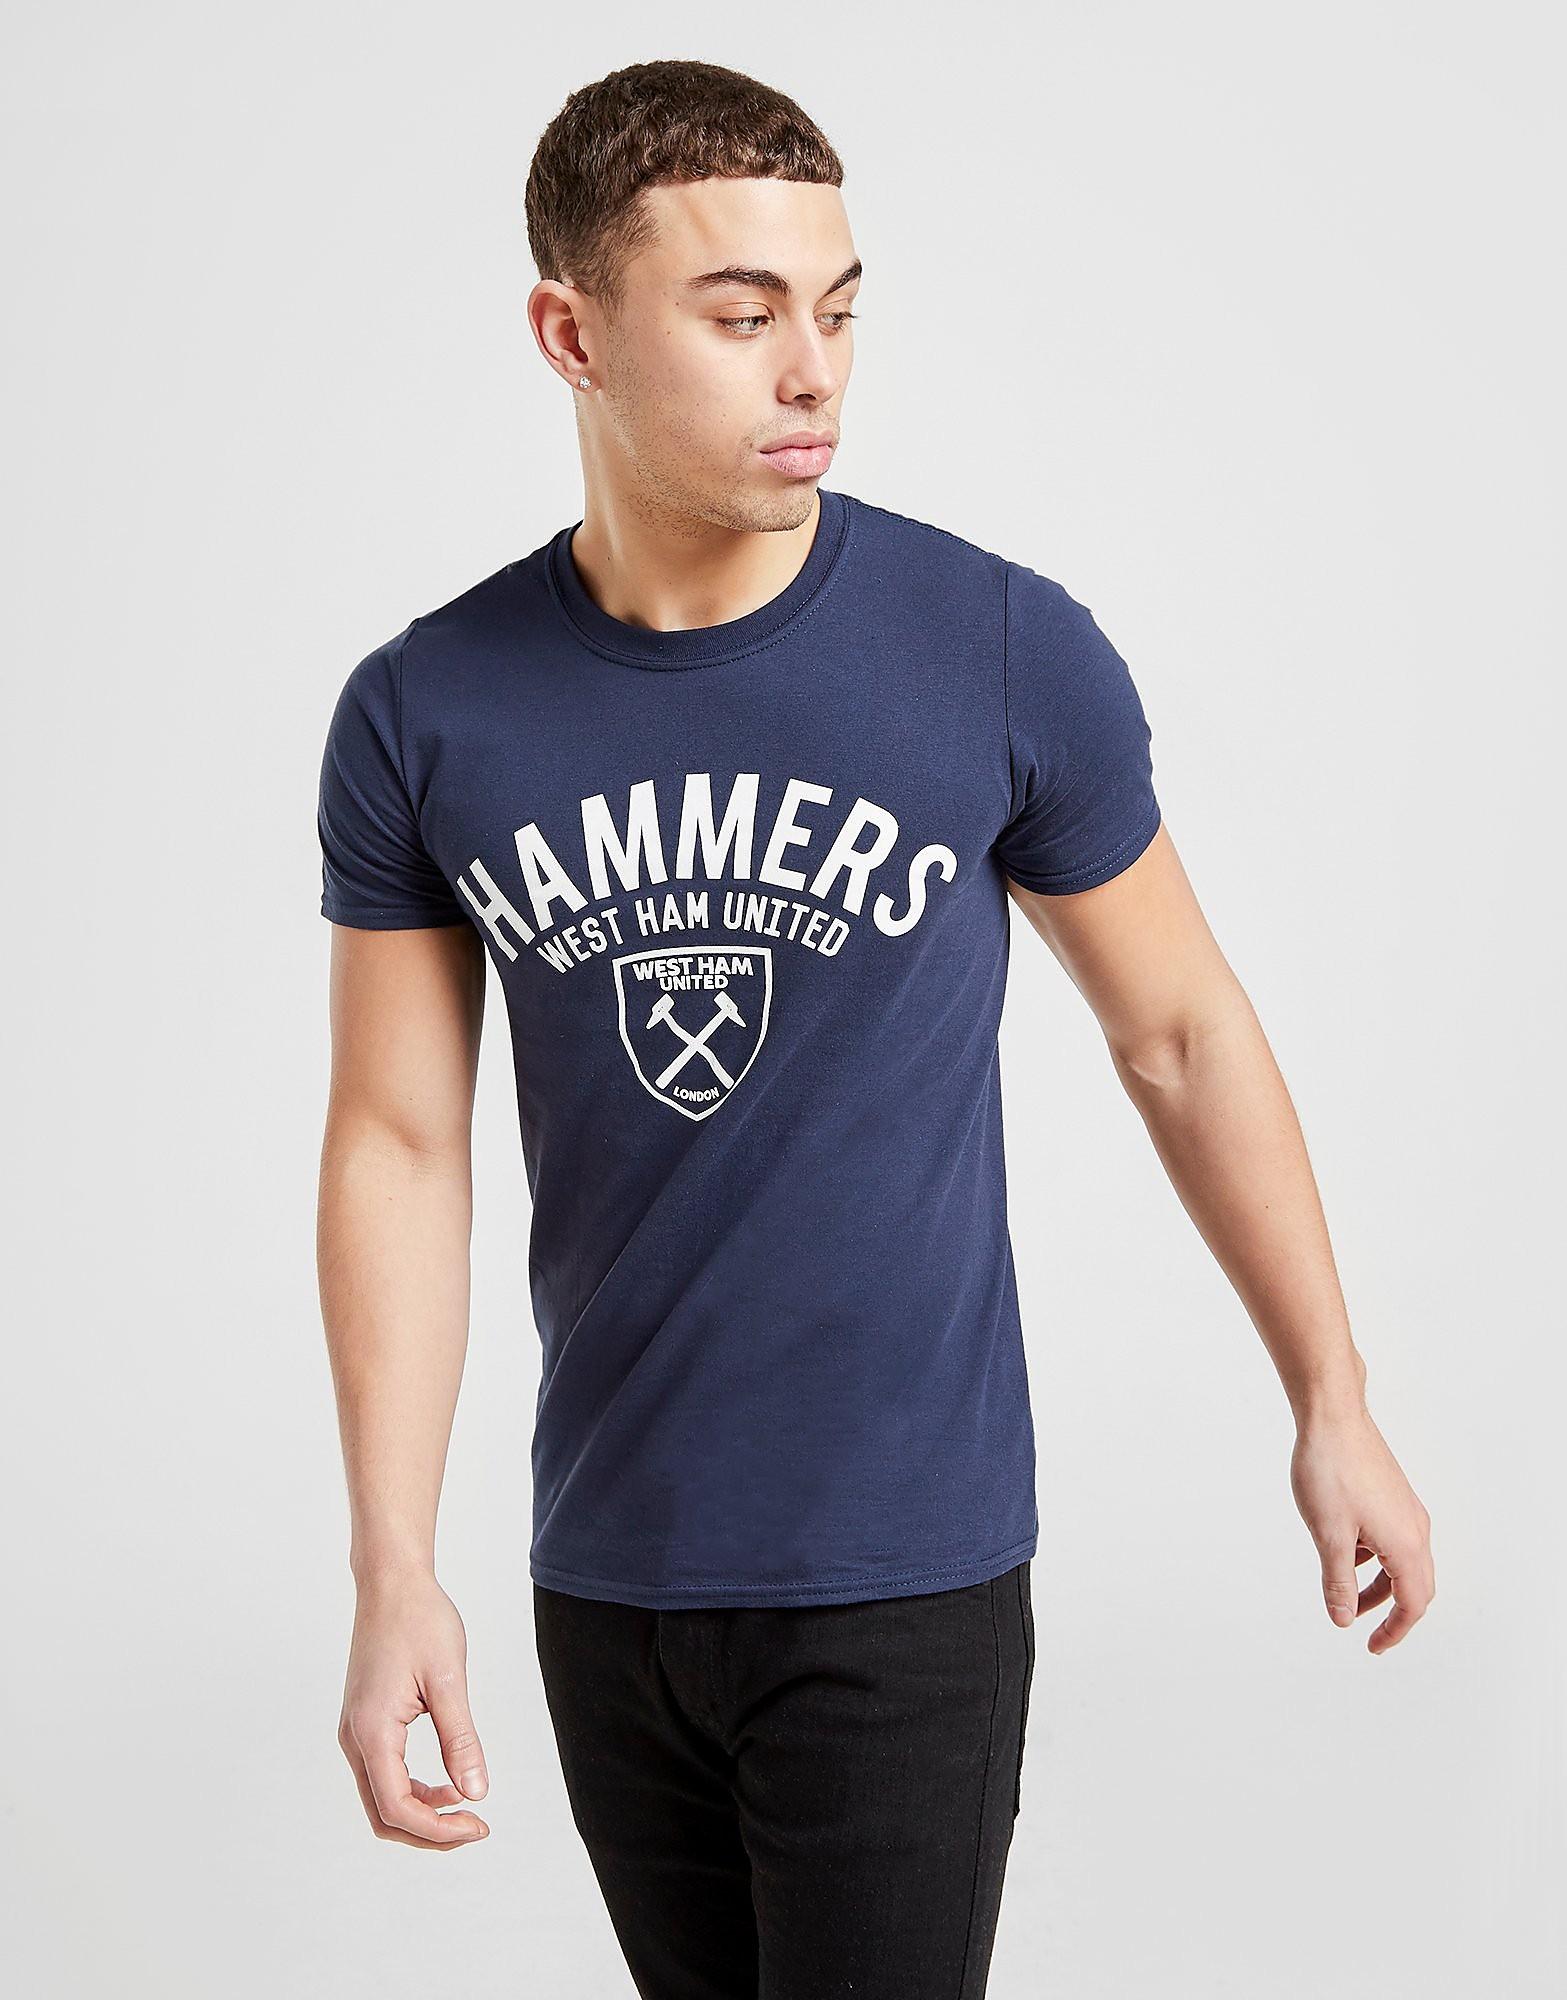 SOURCE LAB LTD West Ham United Hammers T-Shirt